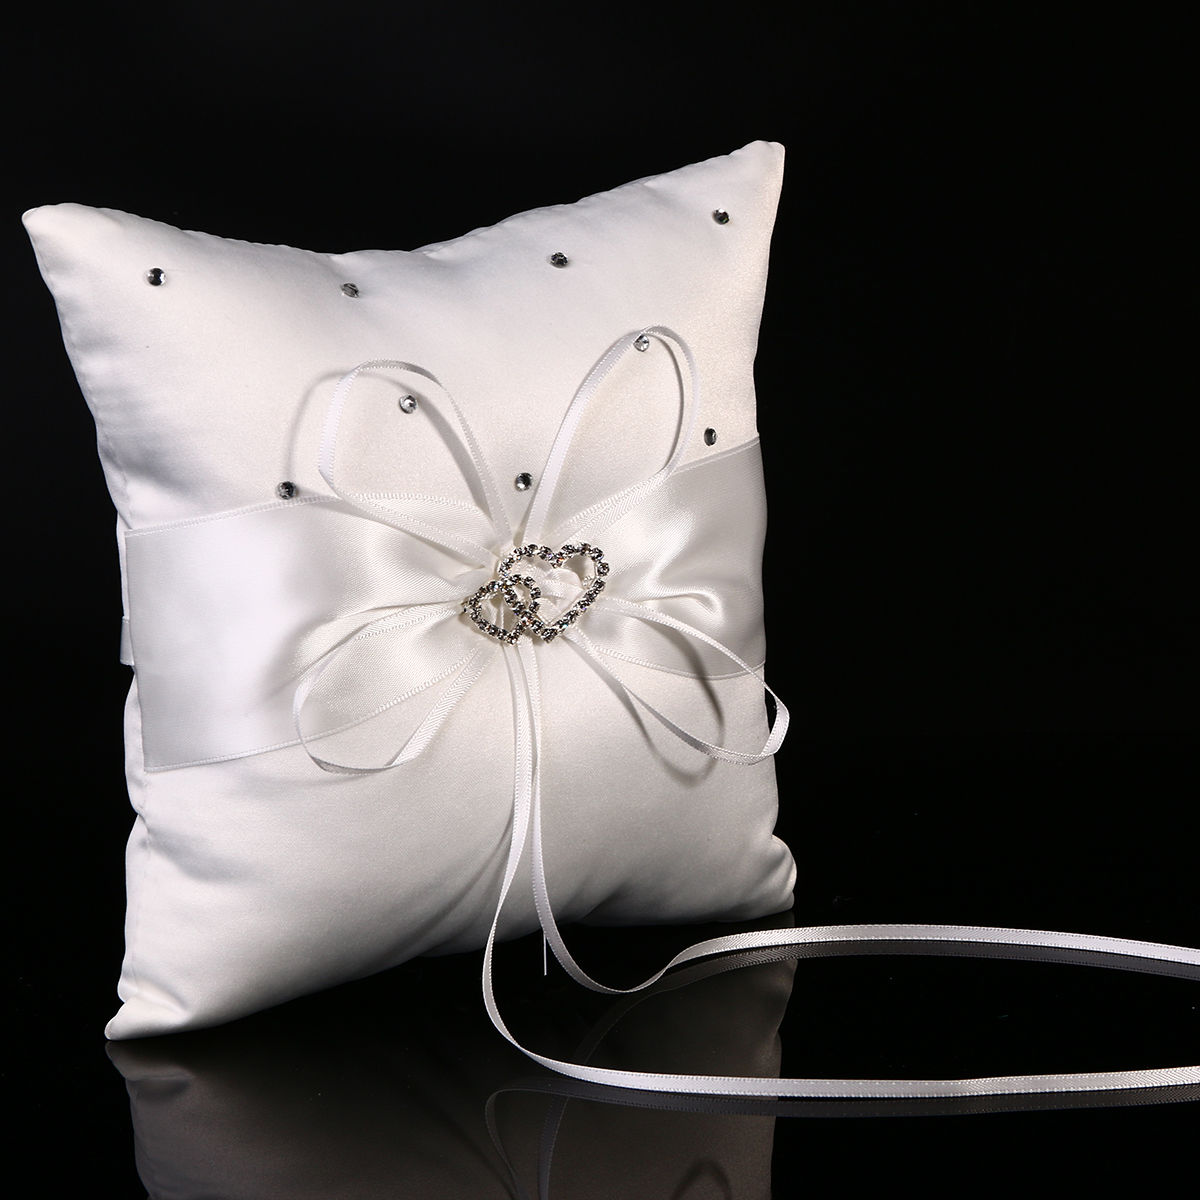 Double Ring Wedding Ceremony Jewelry Ideas